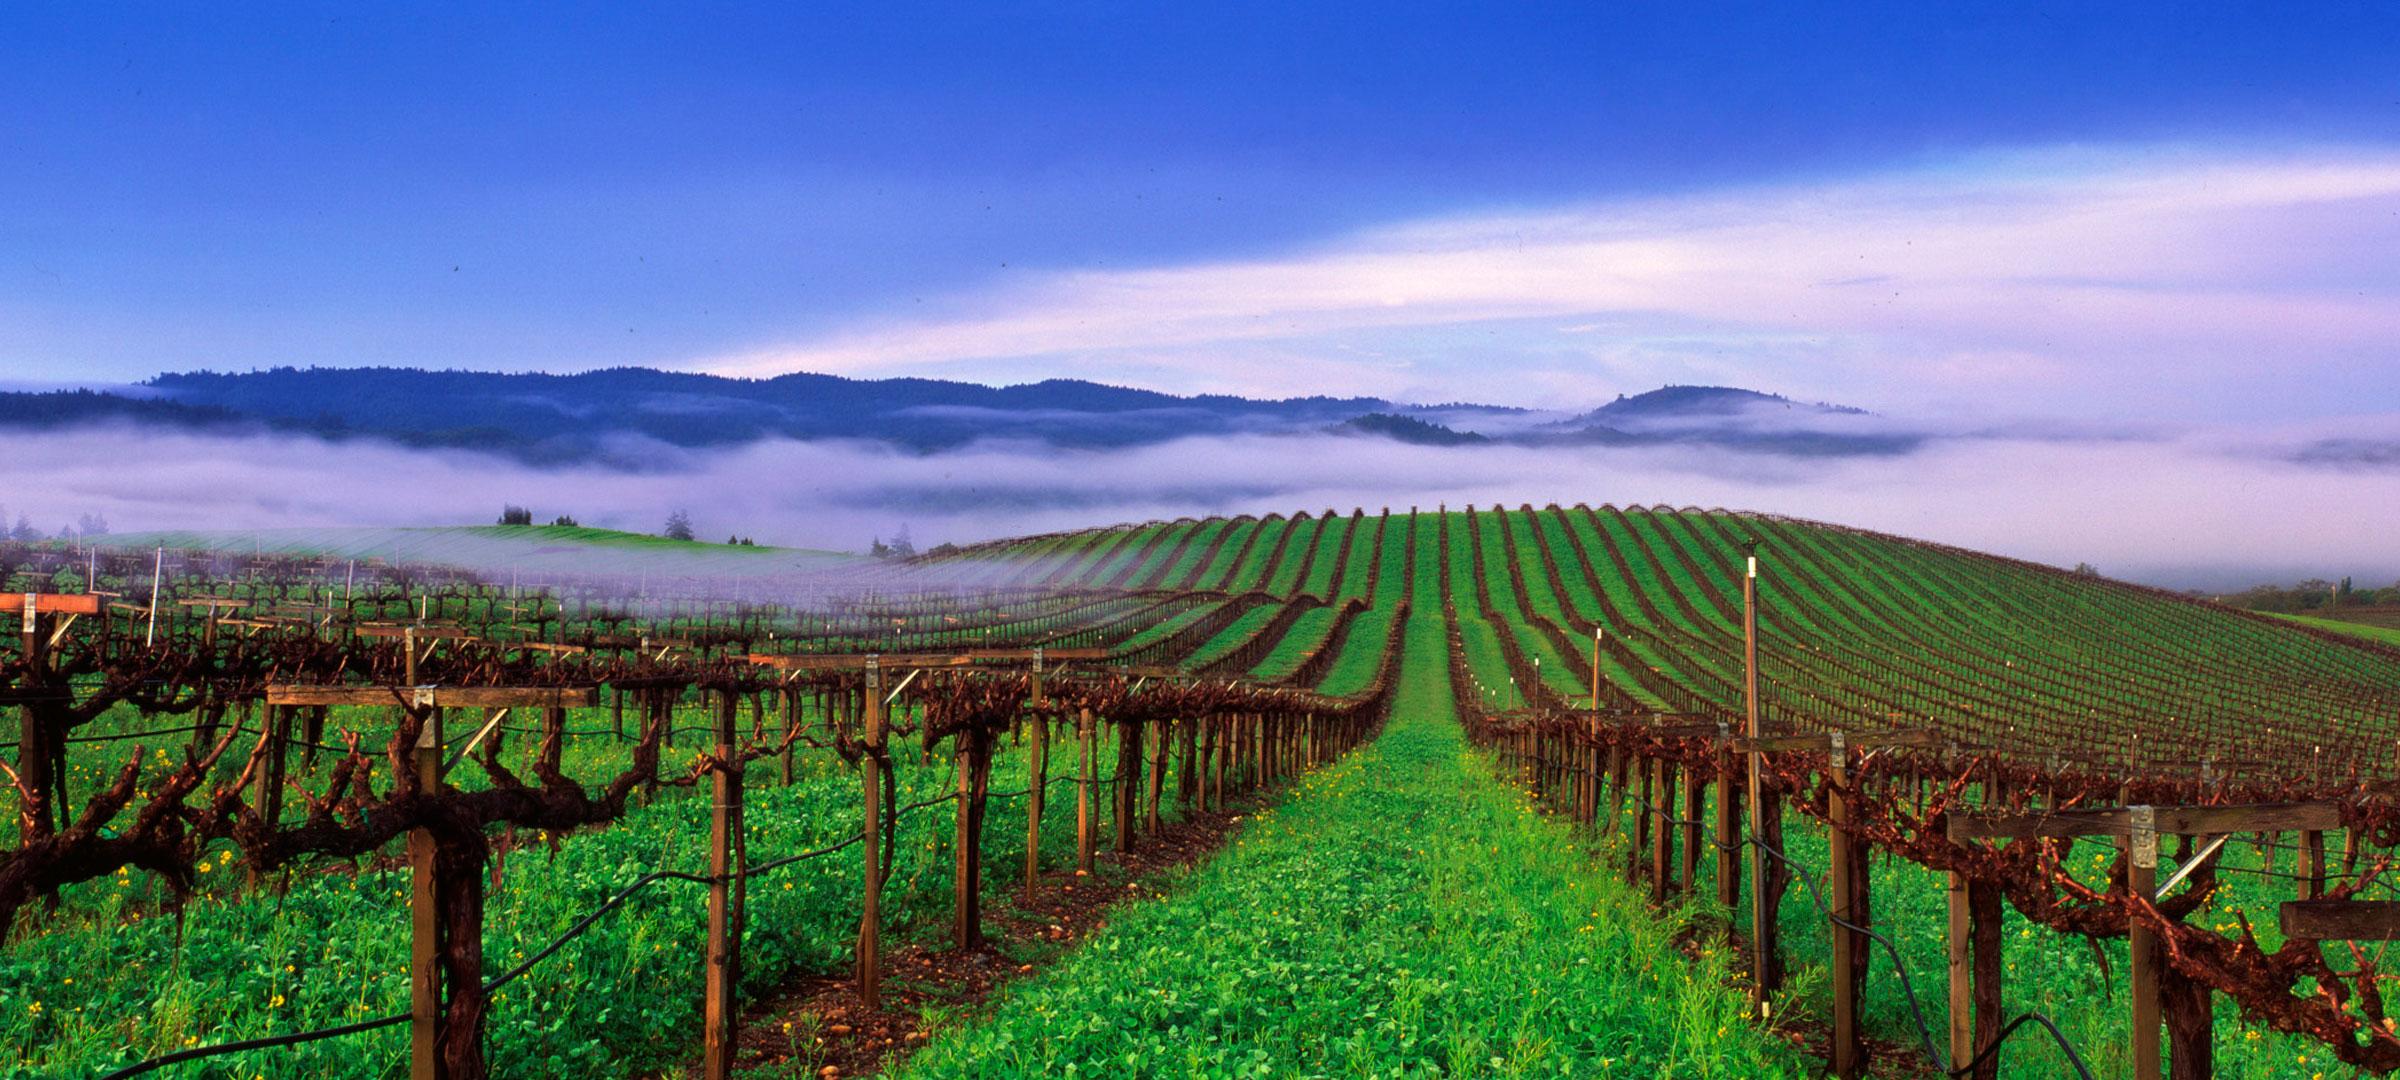 Join us for Dinner in the Vineyard